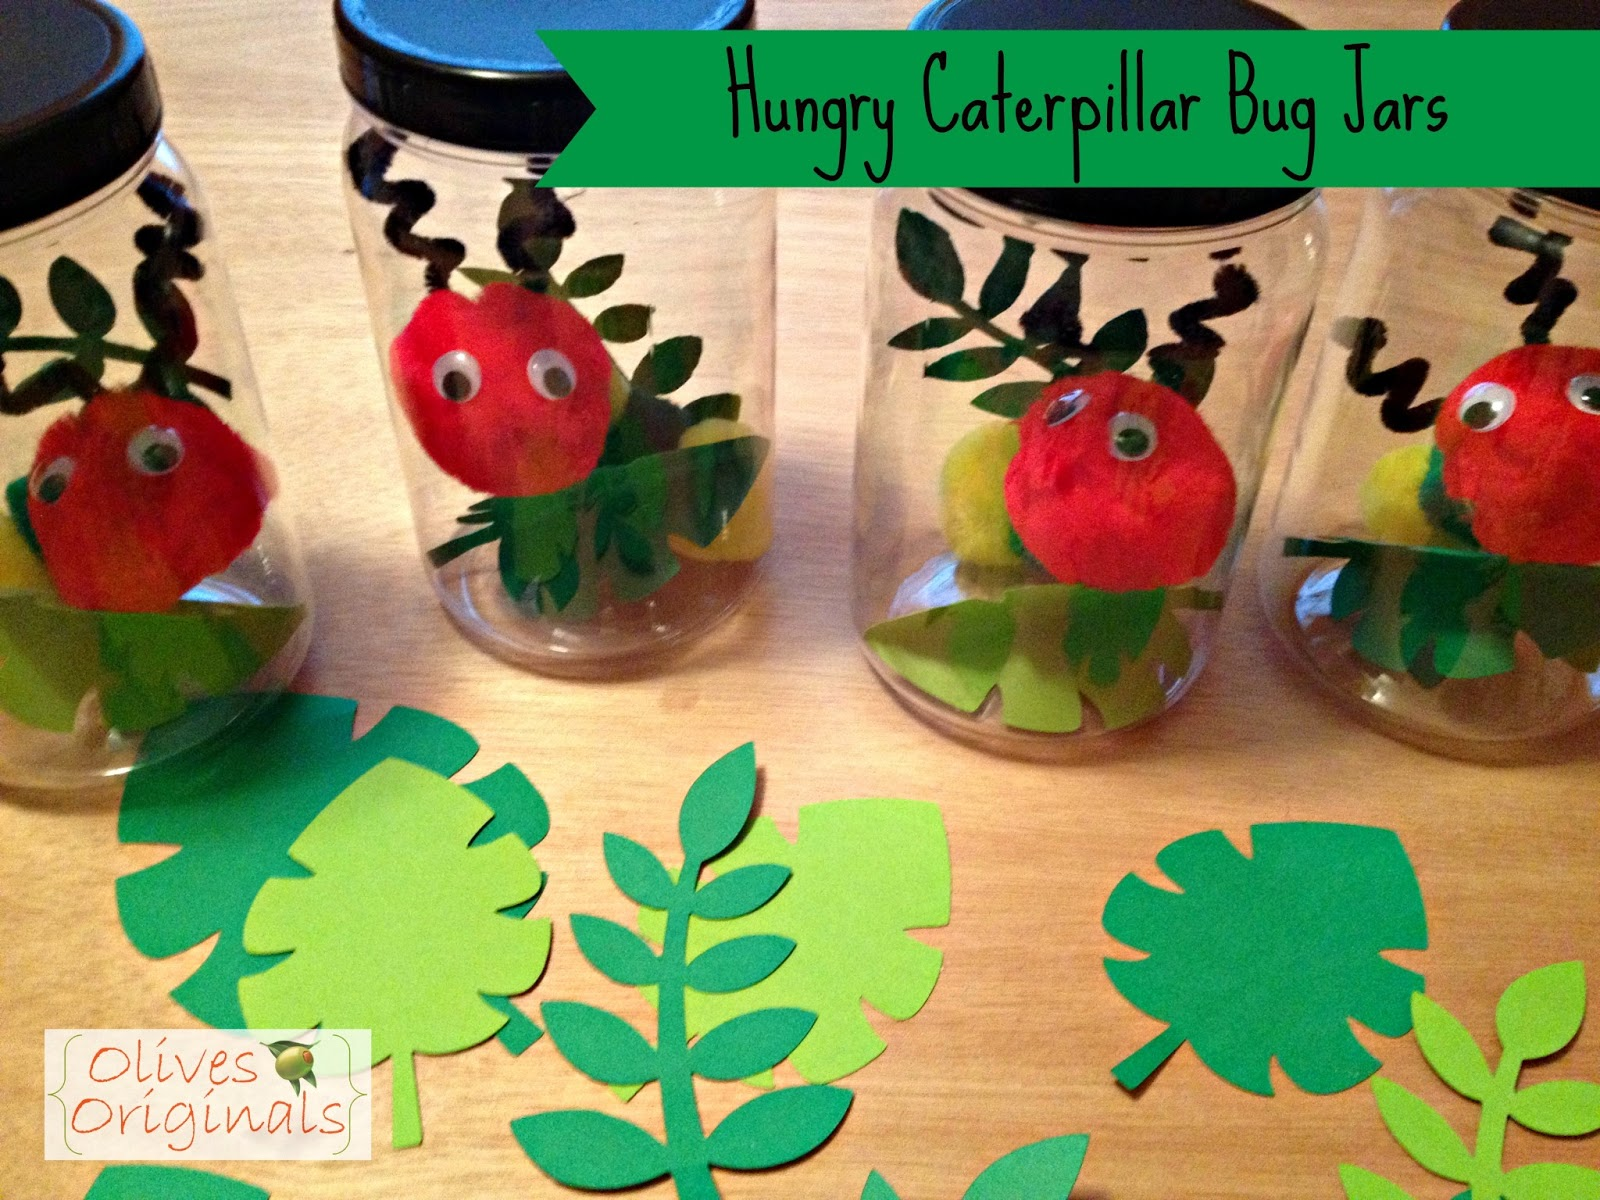 Olives Originals Tutorial Caterpillar Bug Jars